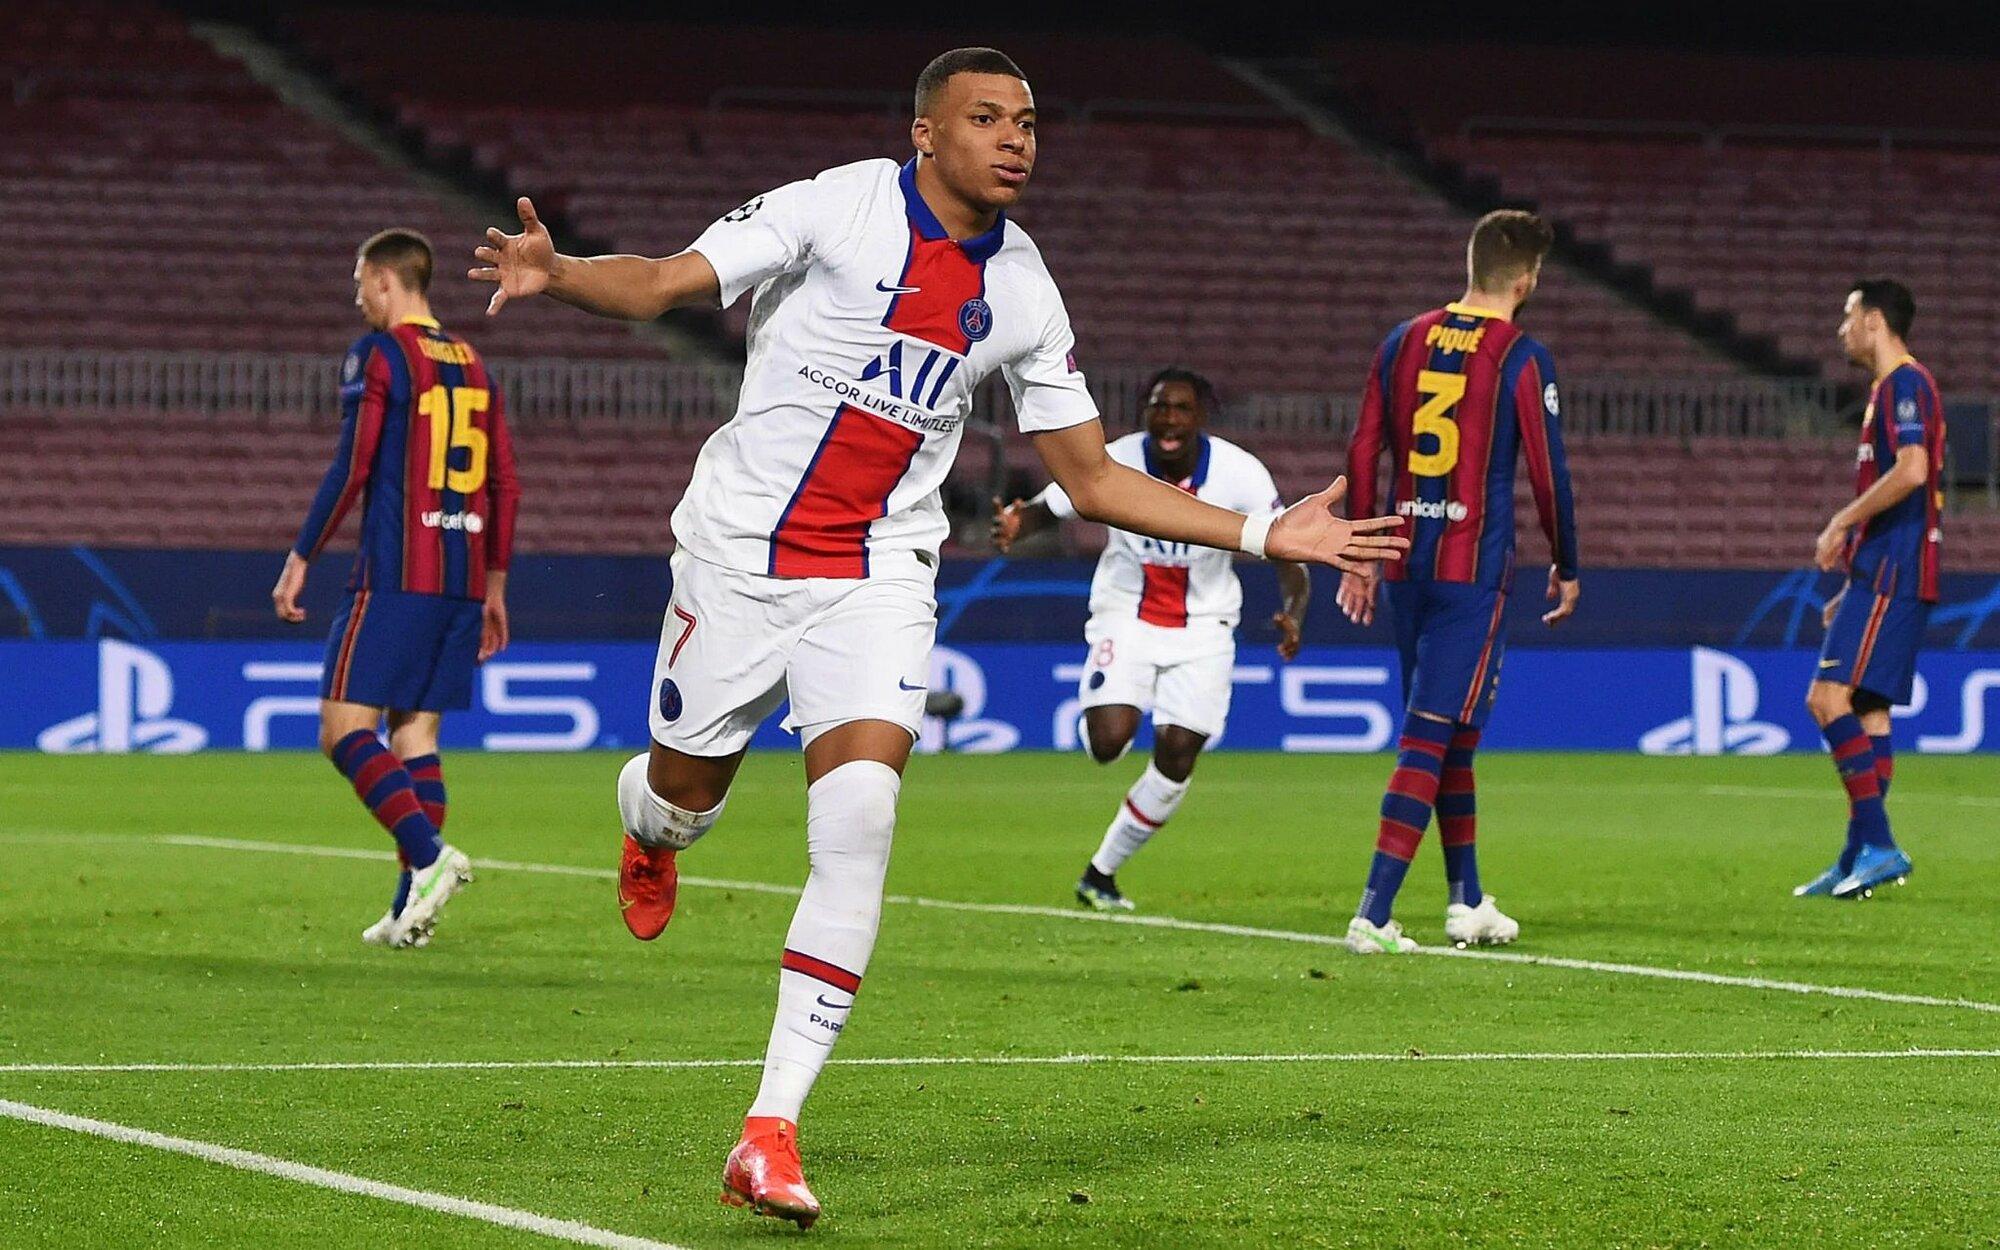 Mbappe ฉลองประตูในเกม PSG กับ Barca ด้วยแฮททริคเมื่อวันที่ 16 กุมภาพันธ์  ภาพ: AP